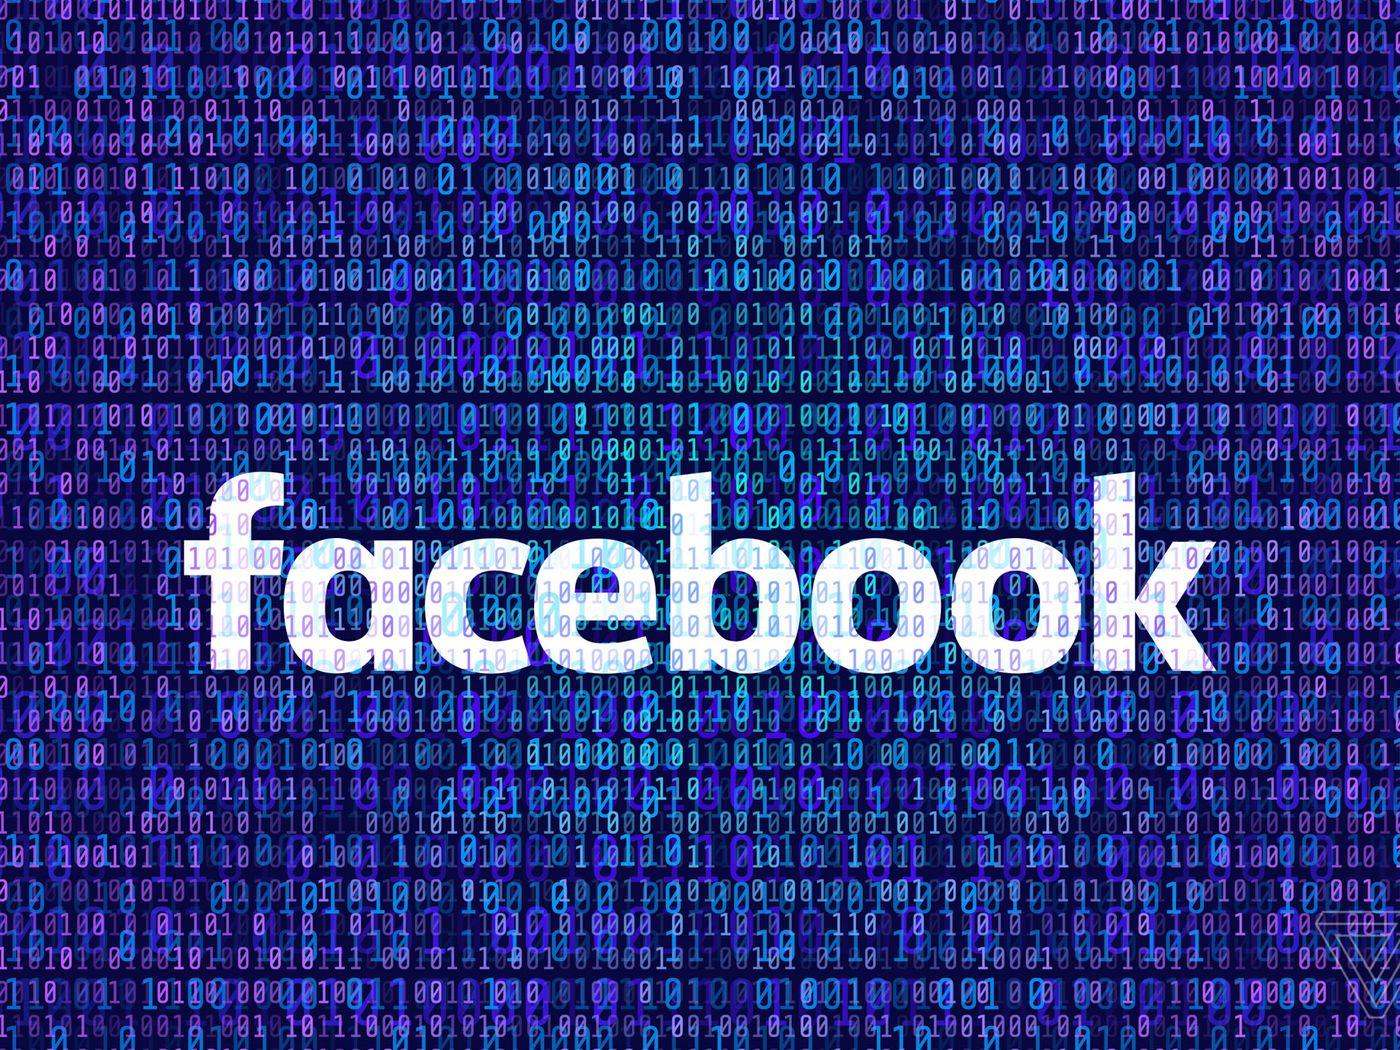 """BeKnown"" in Facebook"